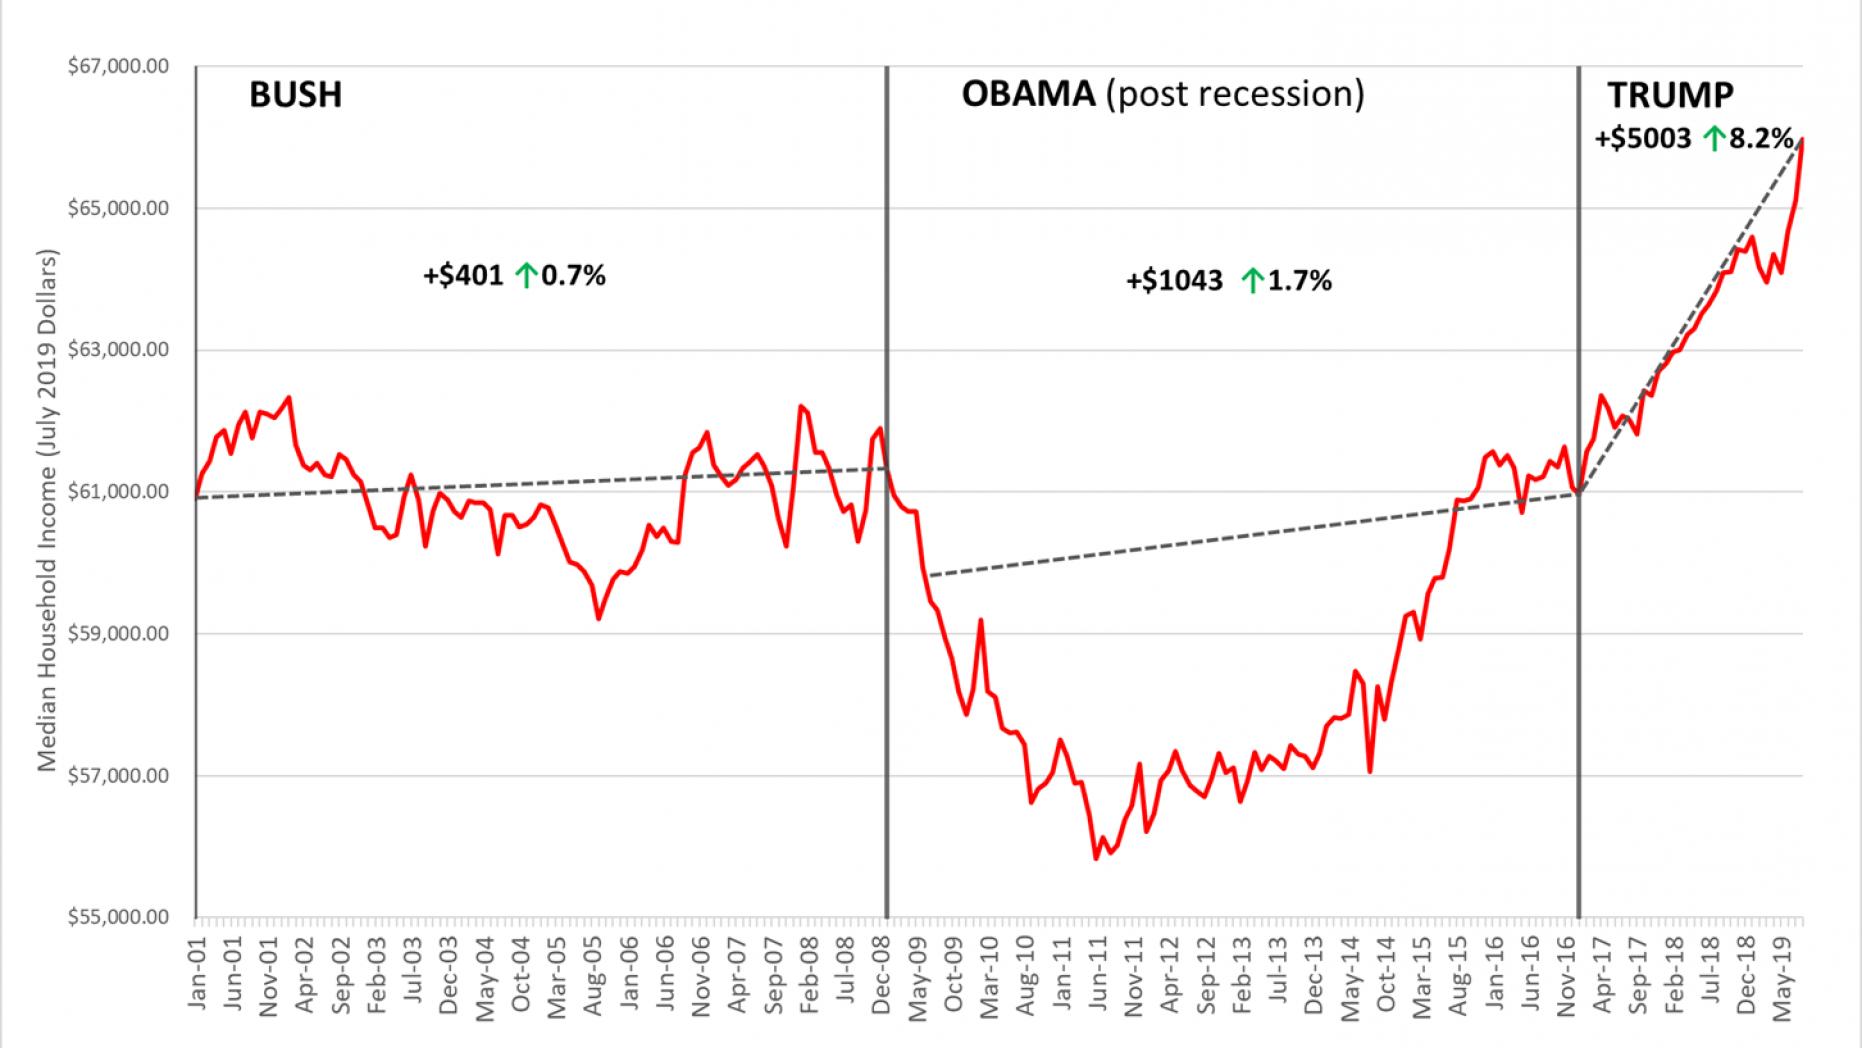 4-aumento-renta-familiar-obama-trump-bus